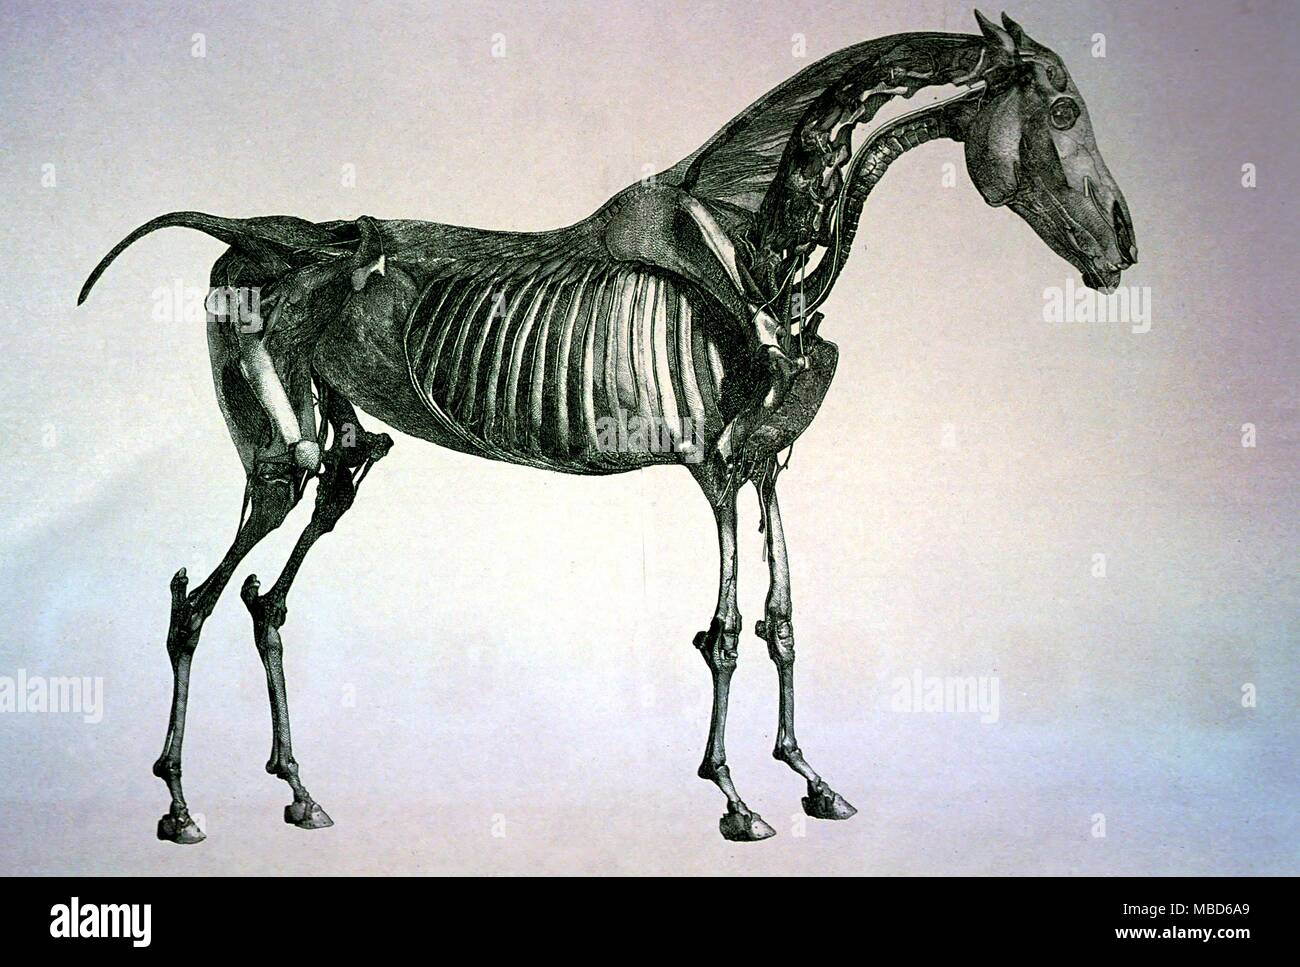 Stubbs Horse Stockfotos & Stubbs Horse Bilder - Seite 2 - Alamy